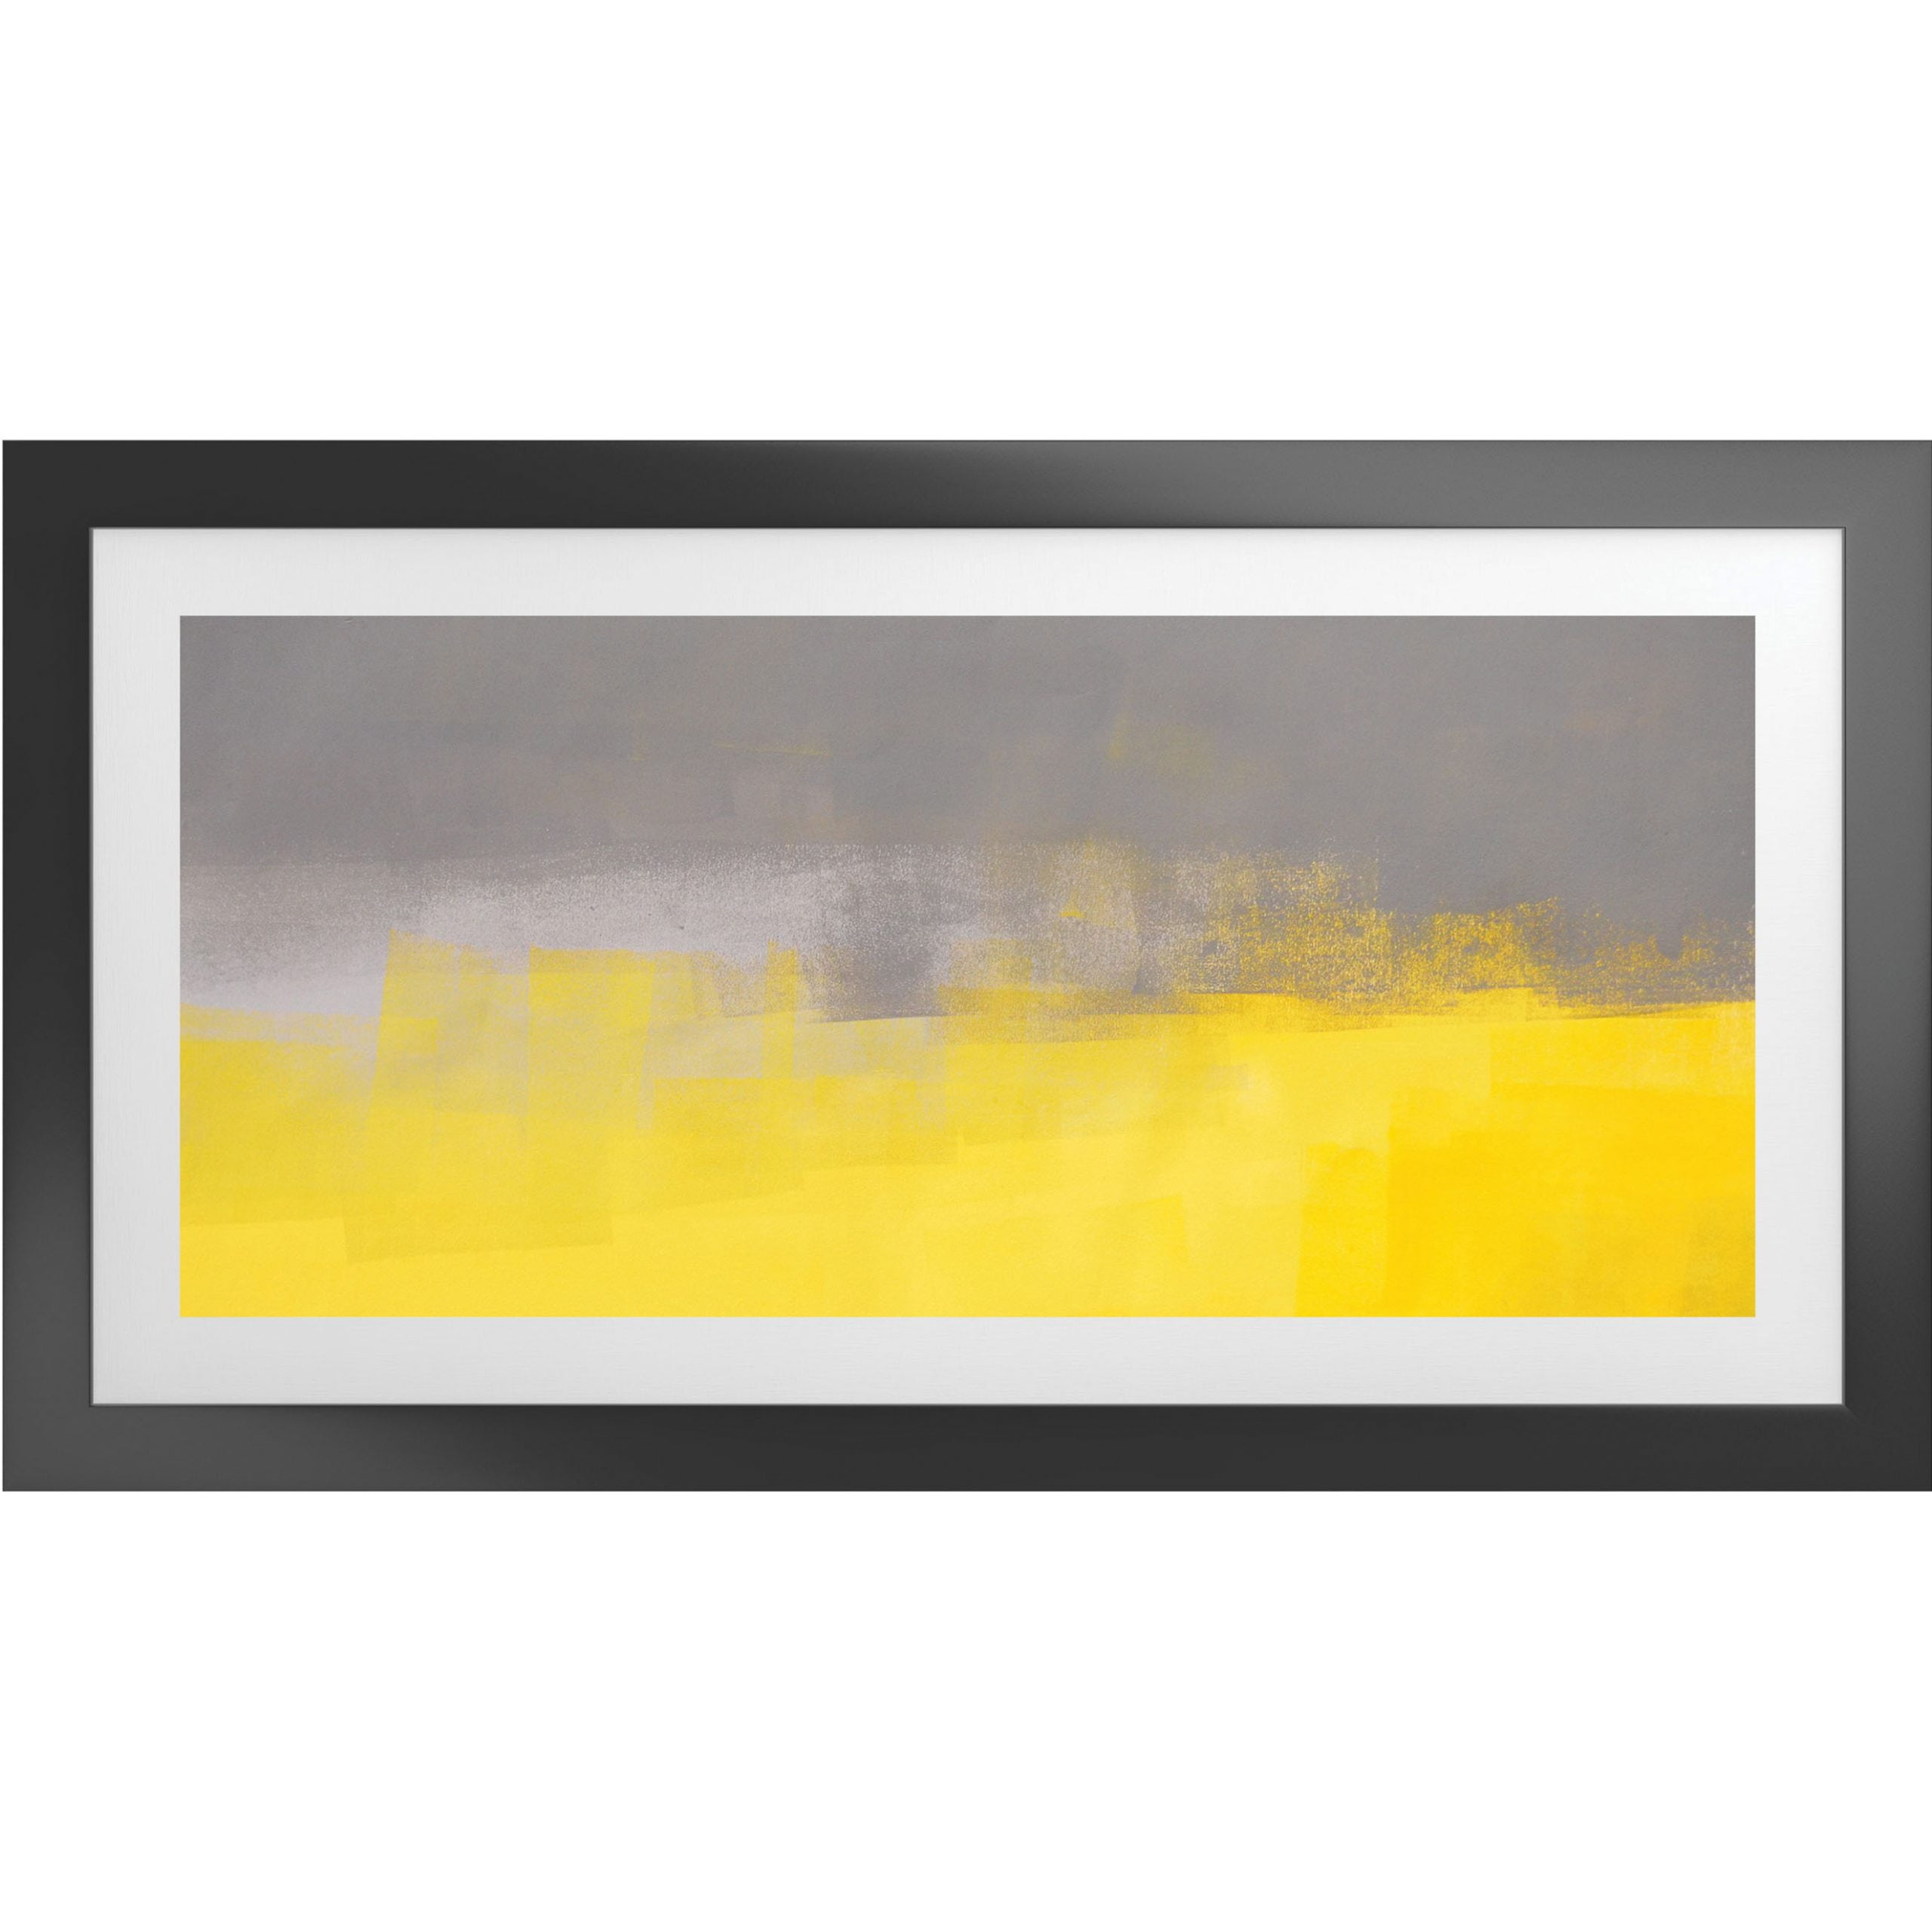 Lumos Artwork with Fornari Black Frame